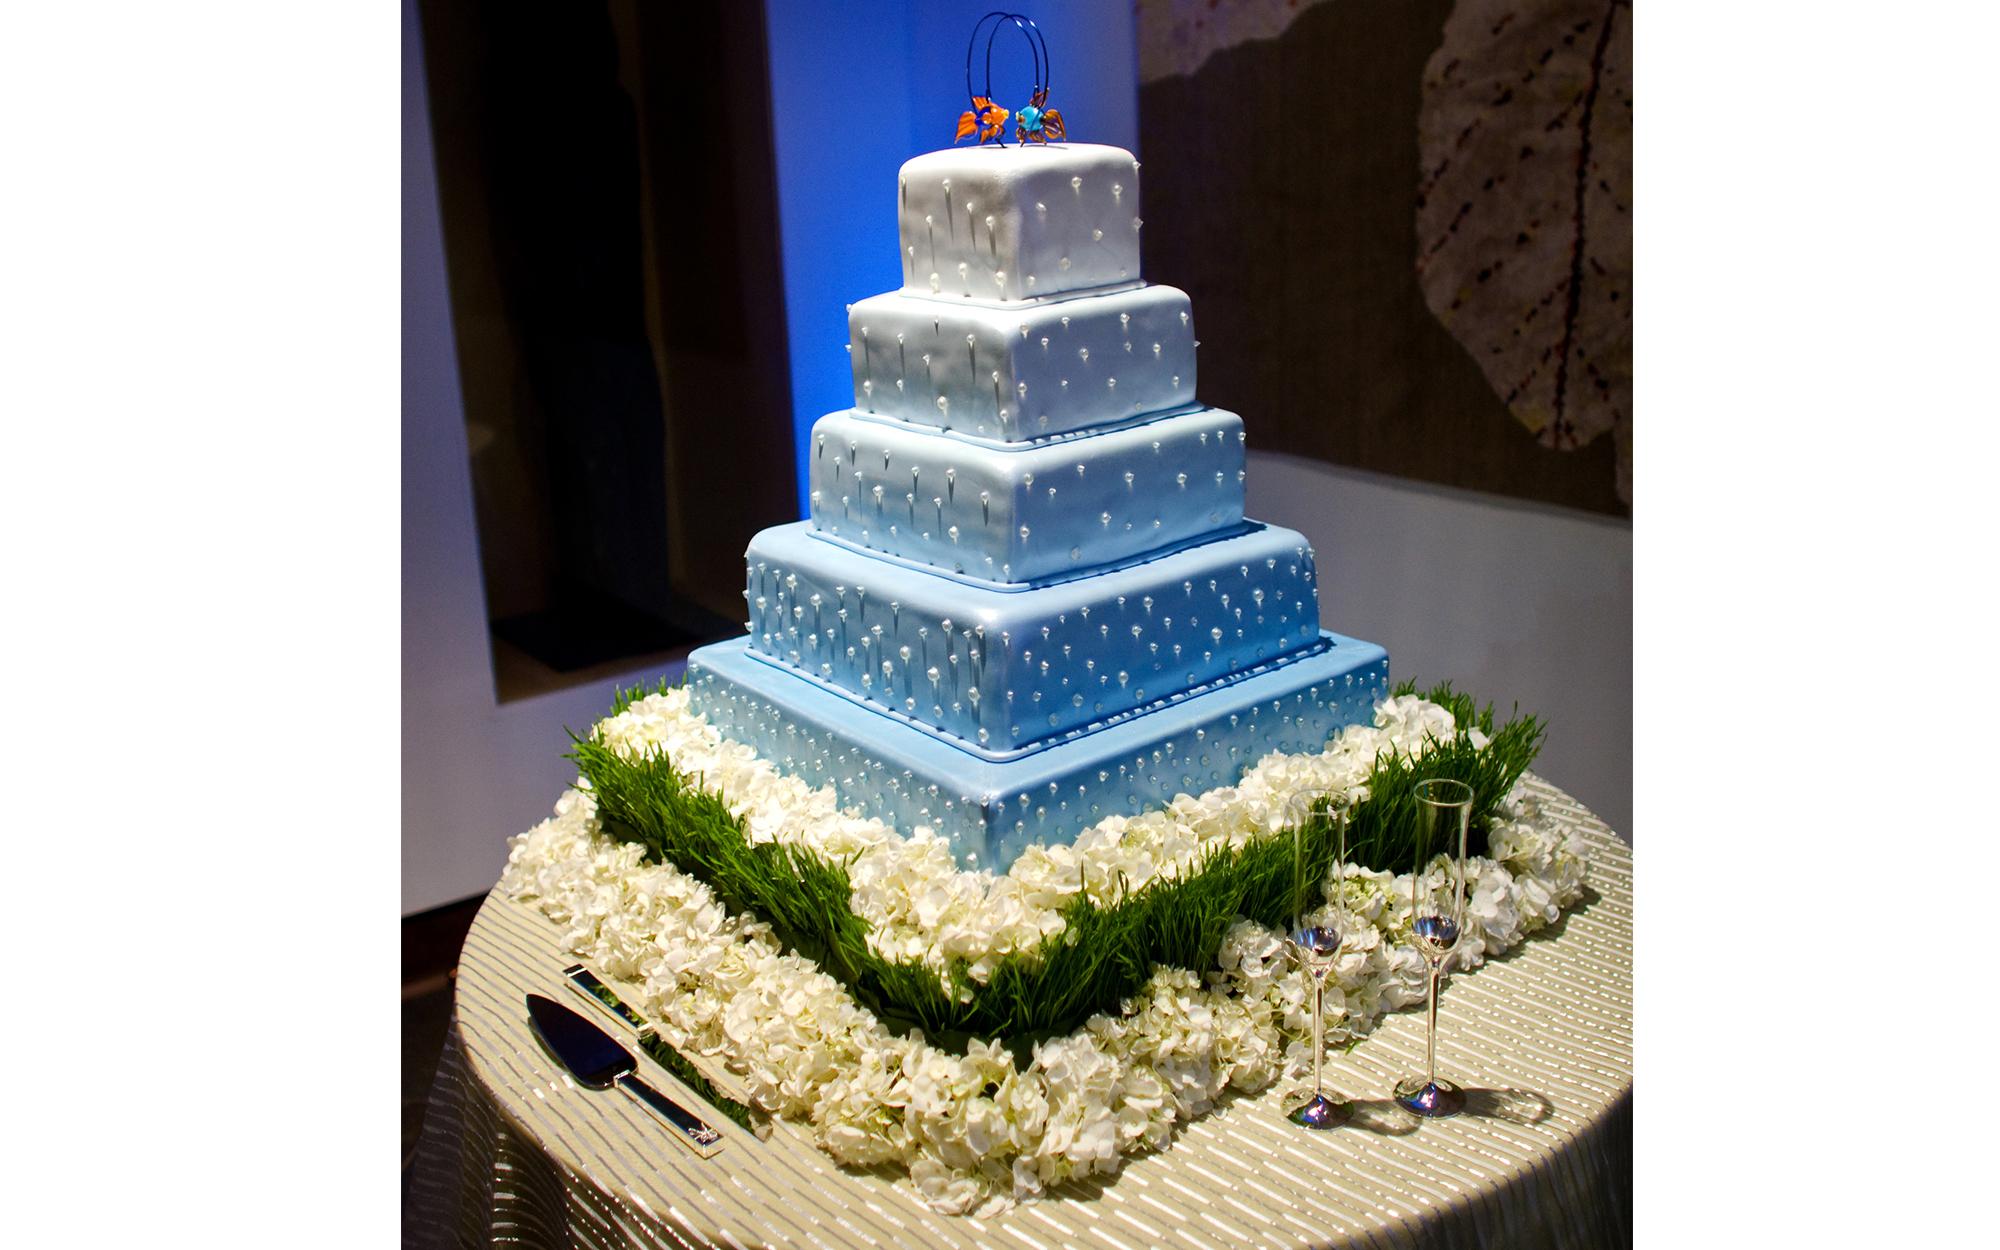 Lighting of Wedding Cake at Dallas World Aquarium